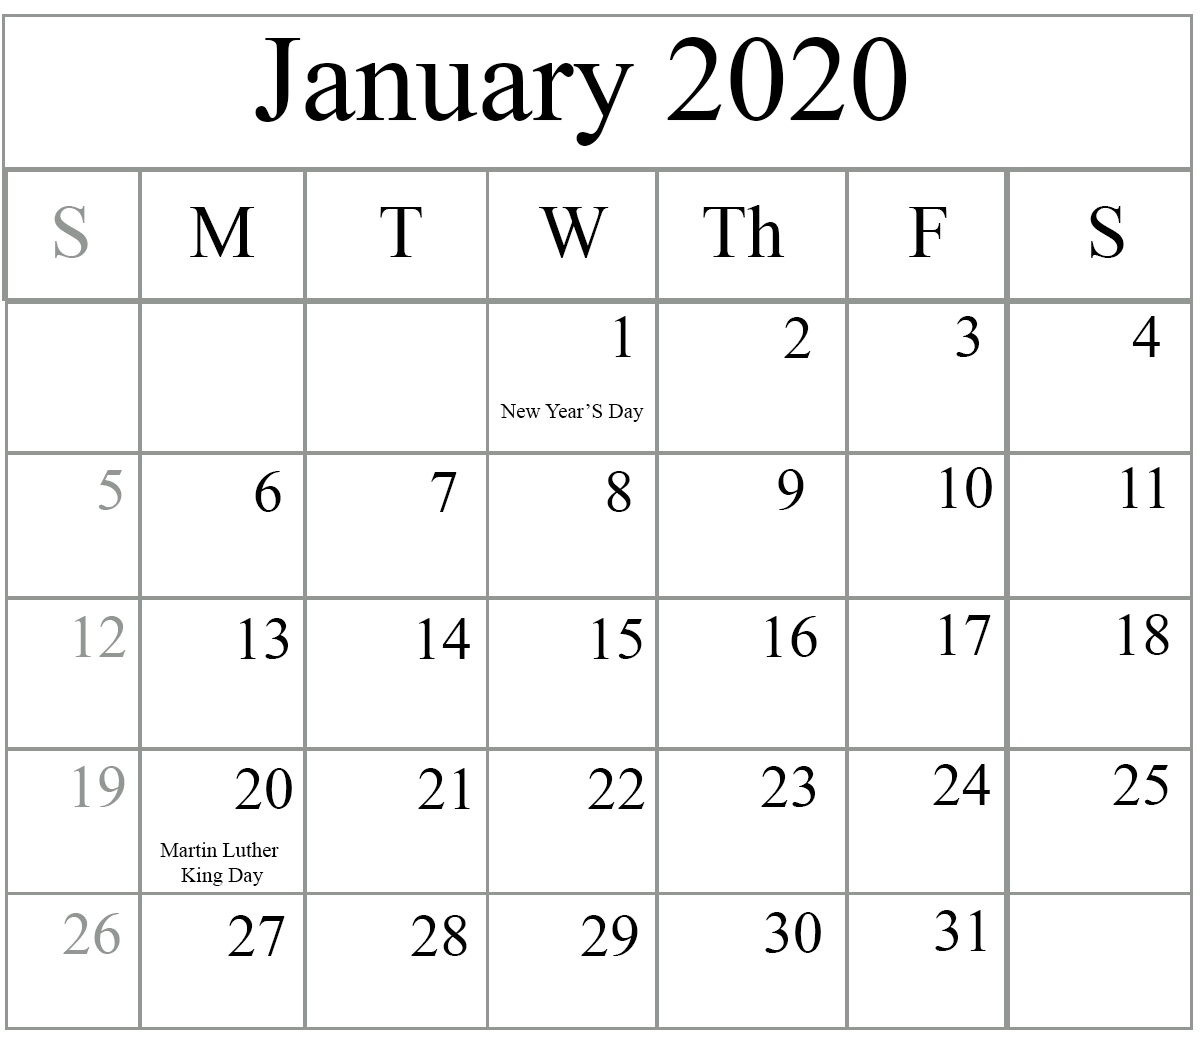 Blank January 2020 Calendar Printable In Pdf, Word, Excel-January 2020 Calendar Excel